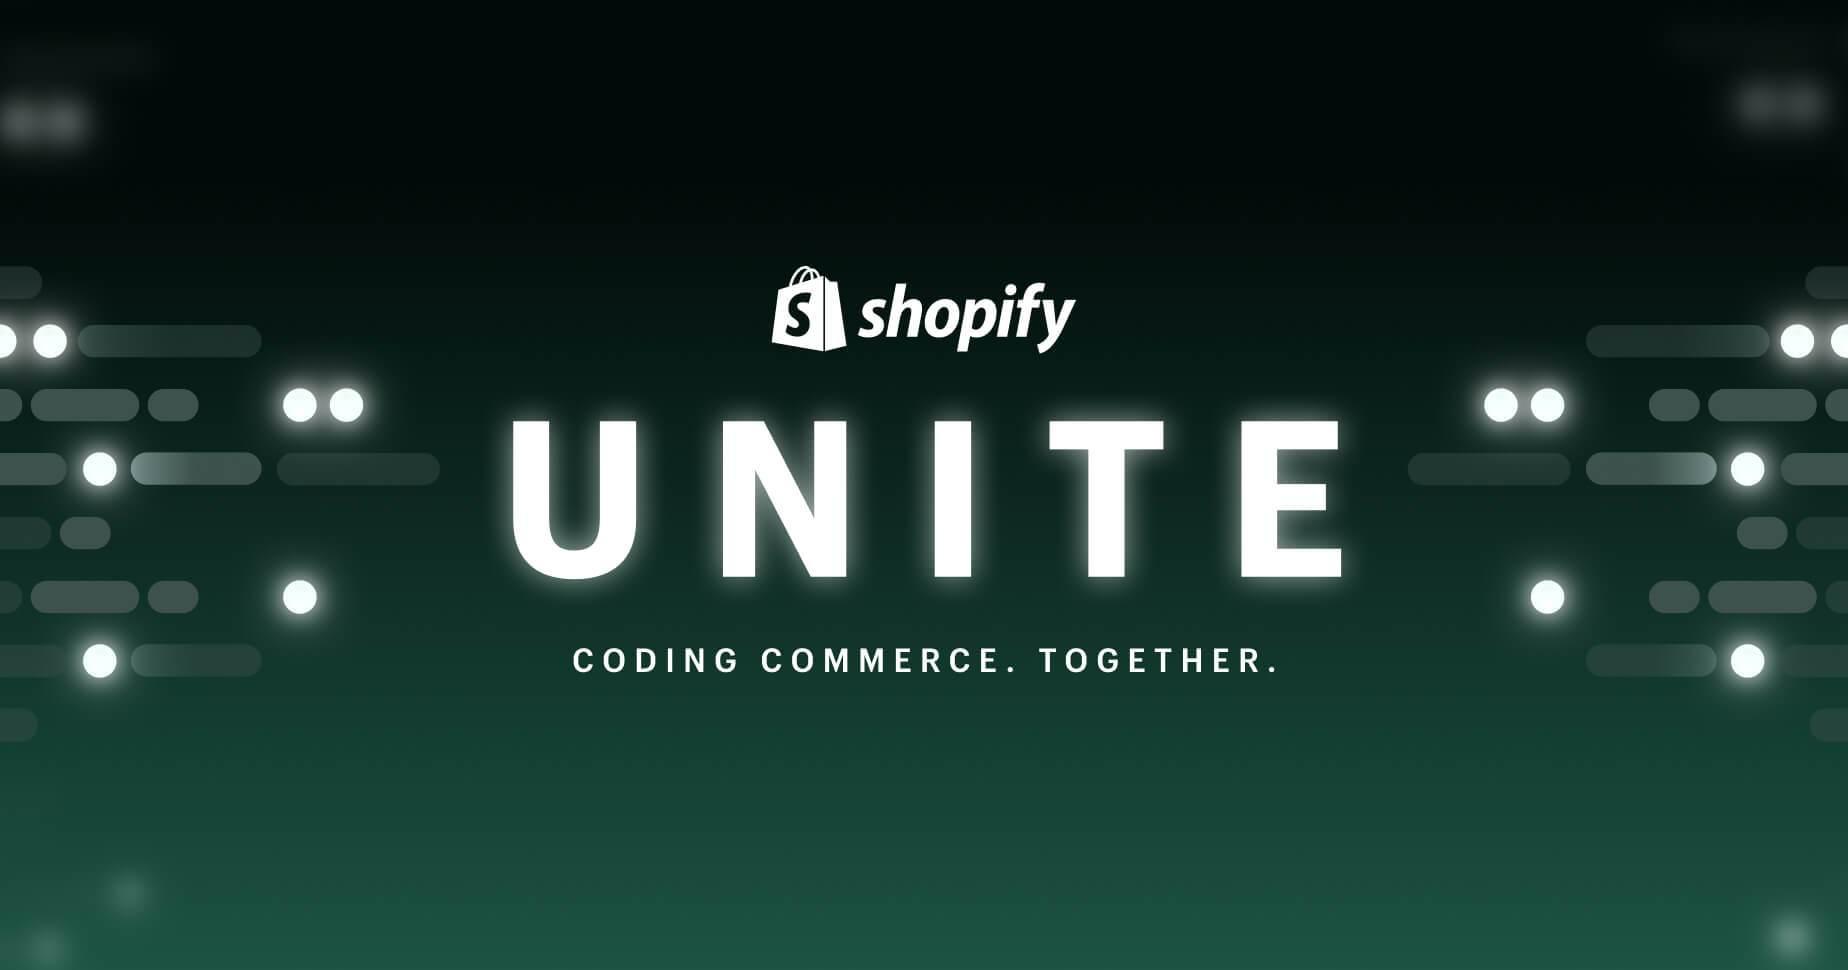 Shopify Unite 2021